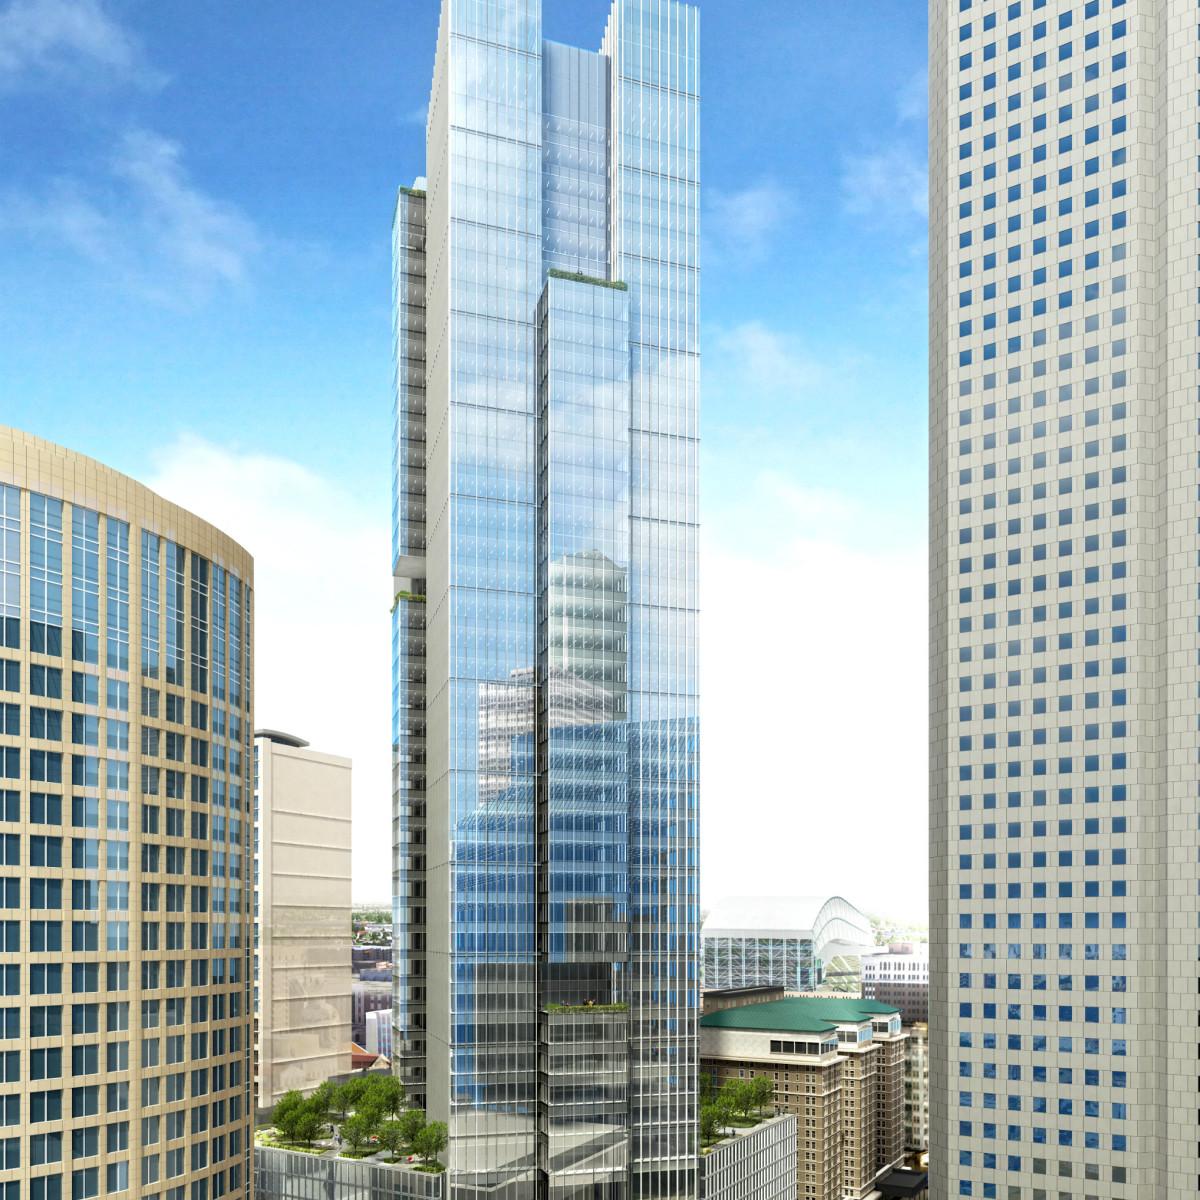 Skyline Apartments Houston: Striking New Downtown Tower Reimagines Old Houston